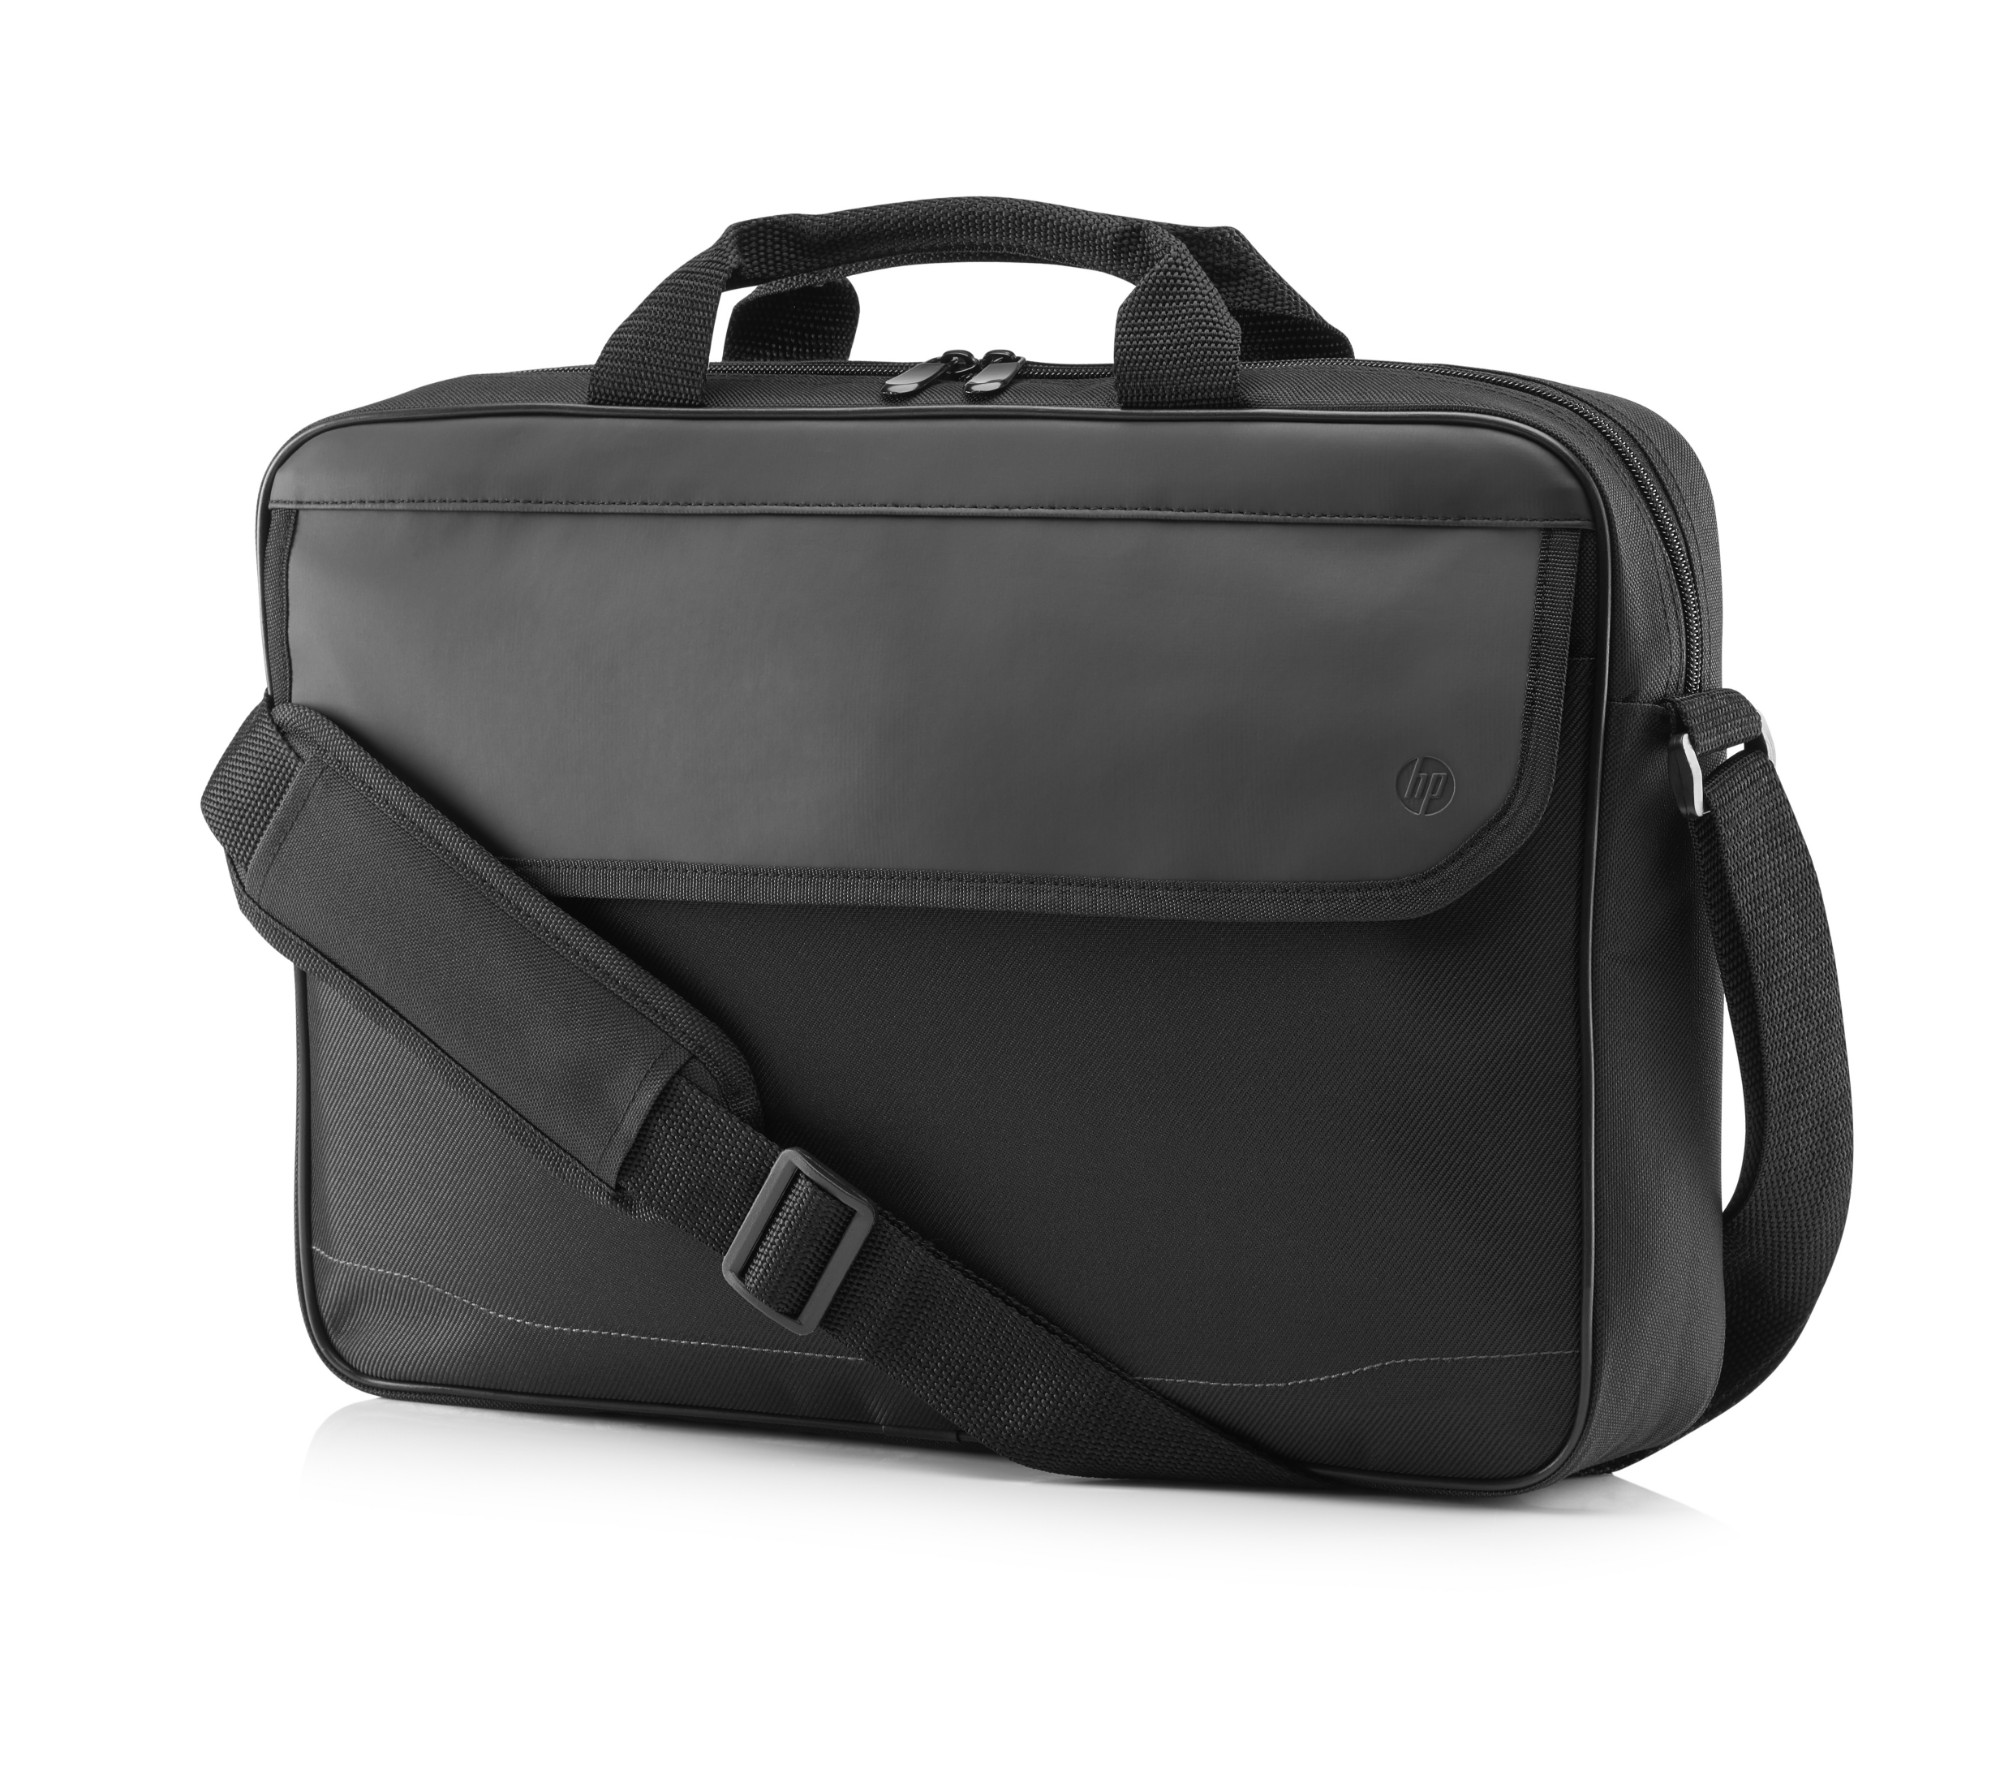 "HP Prelude Top Load 39.6 cm (15.6"") Briefcase Black"